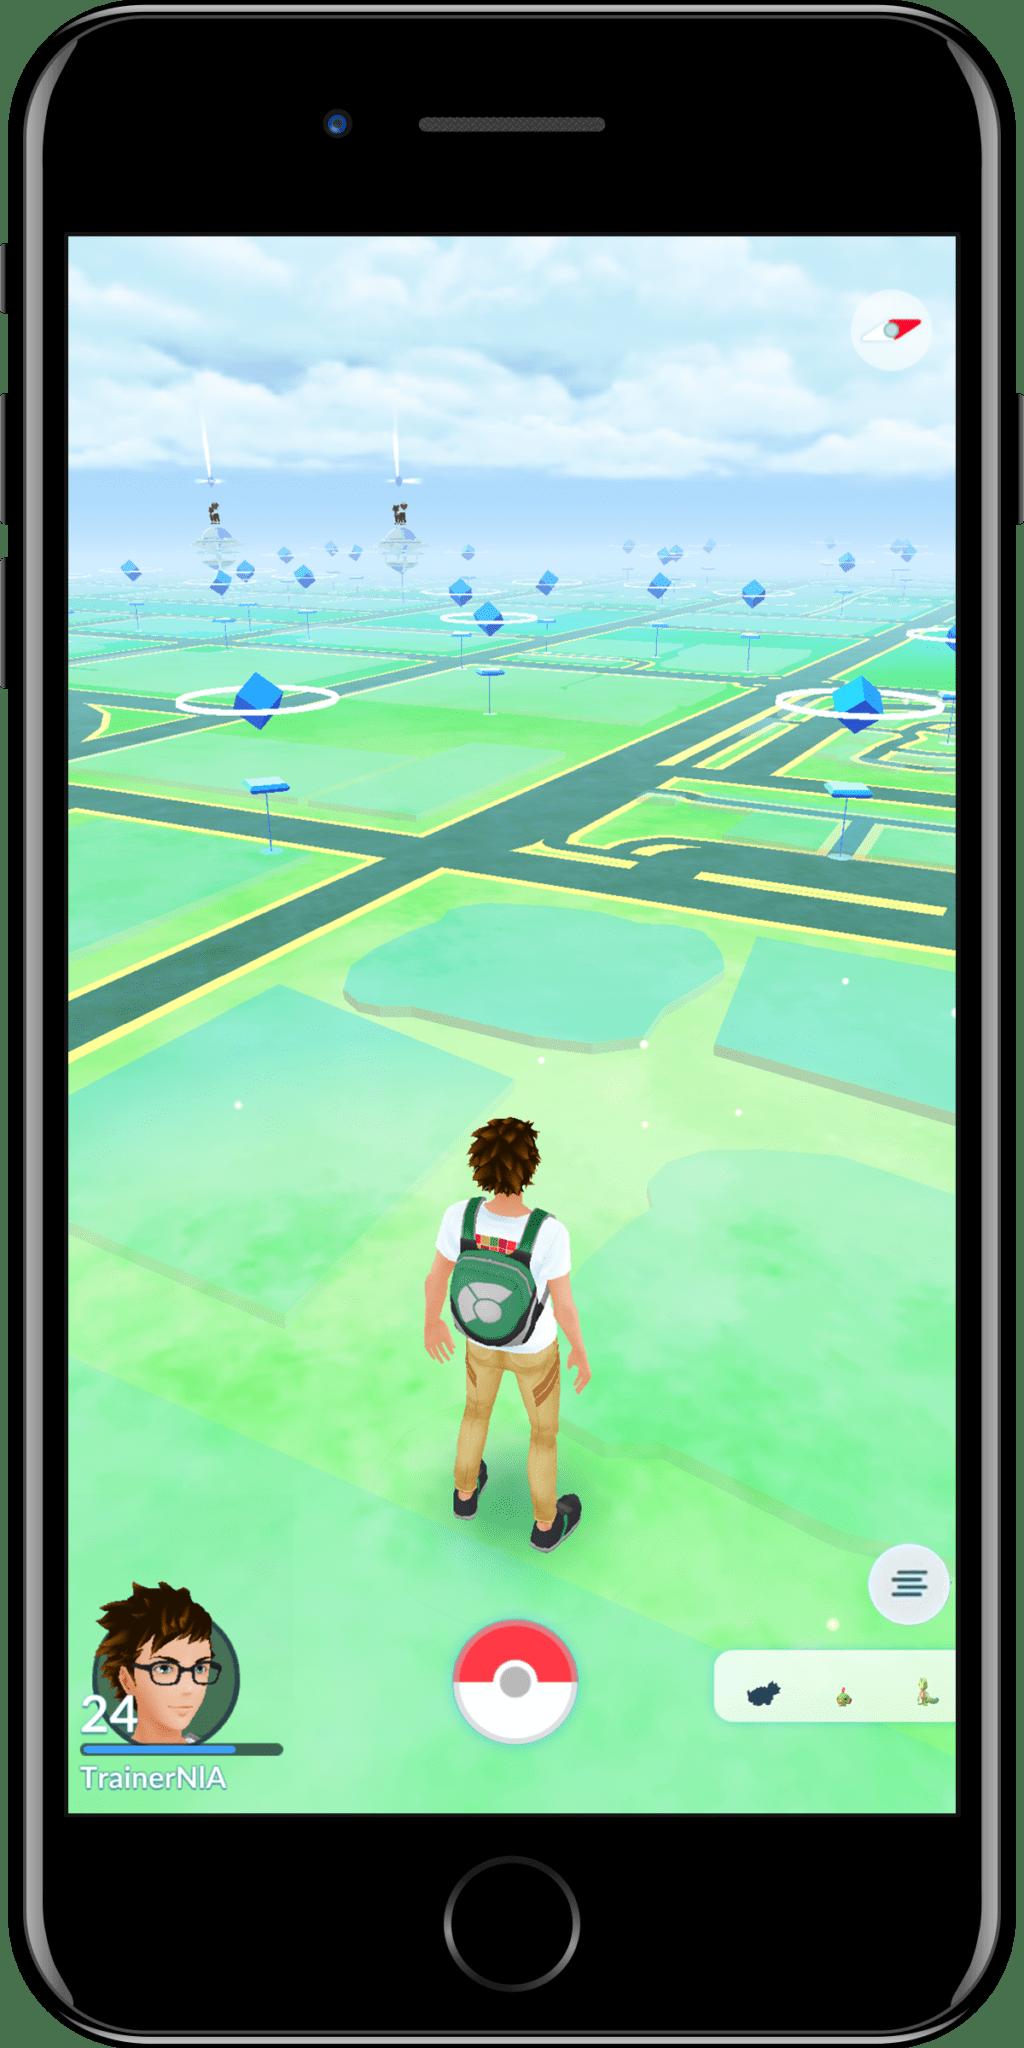 Clima niebla pokemon go